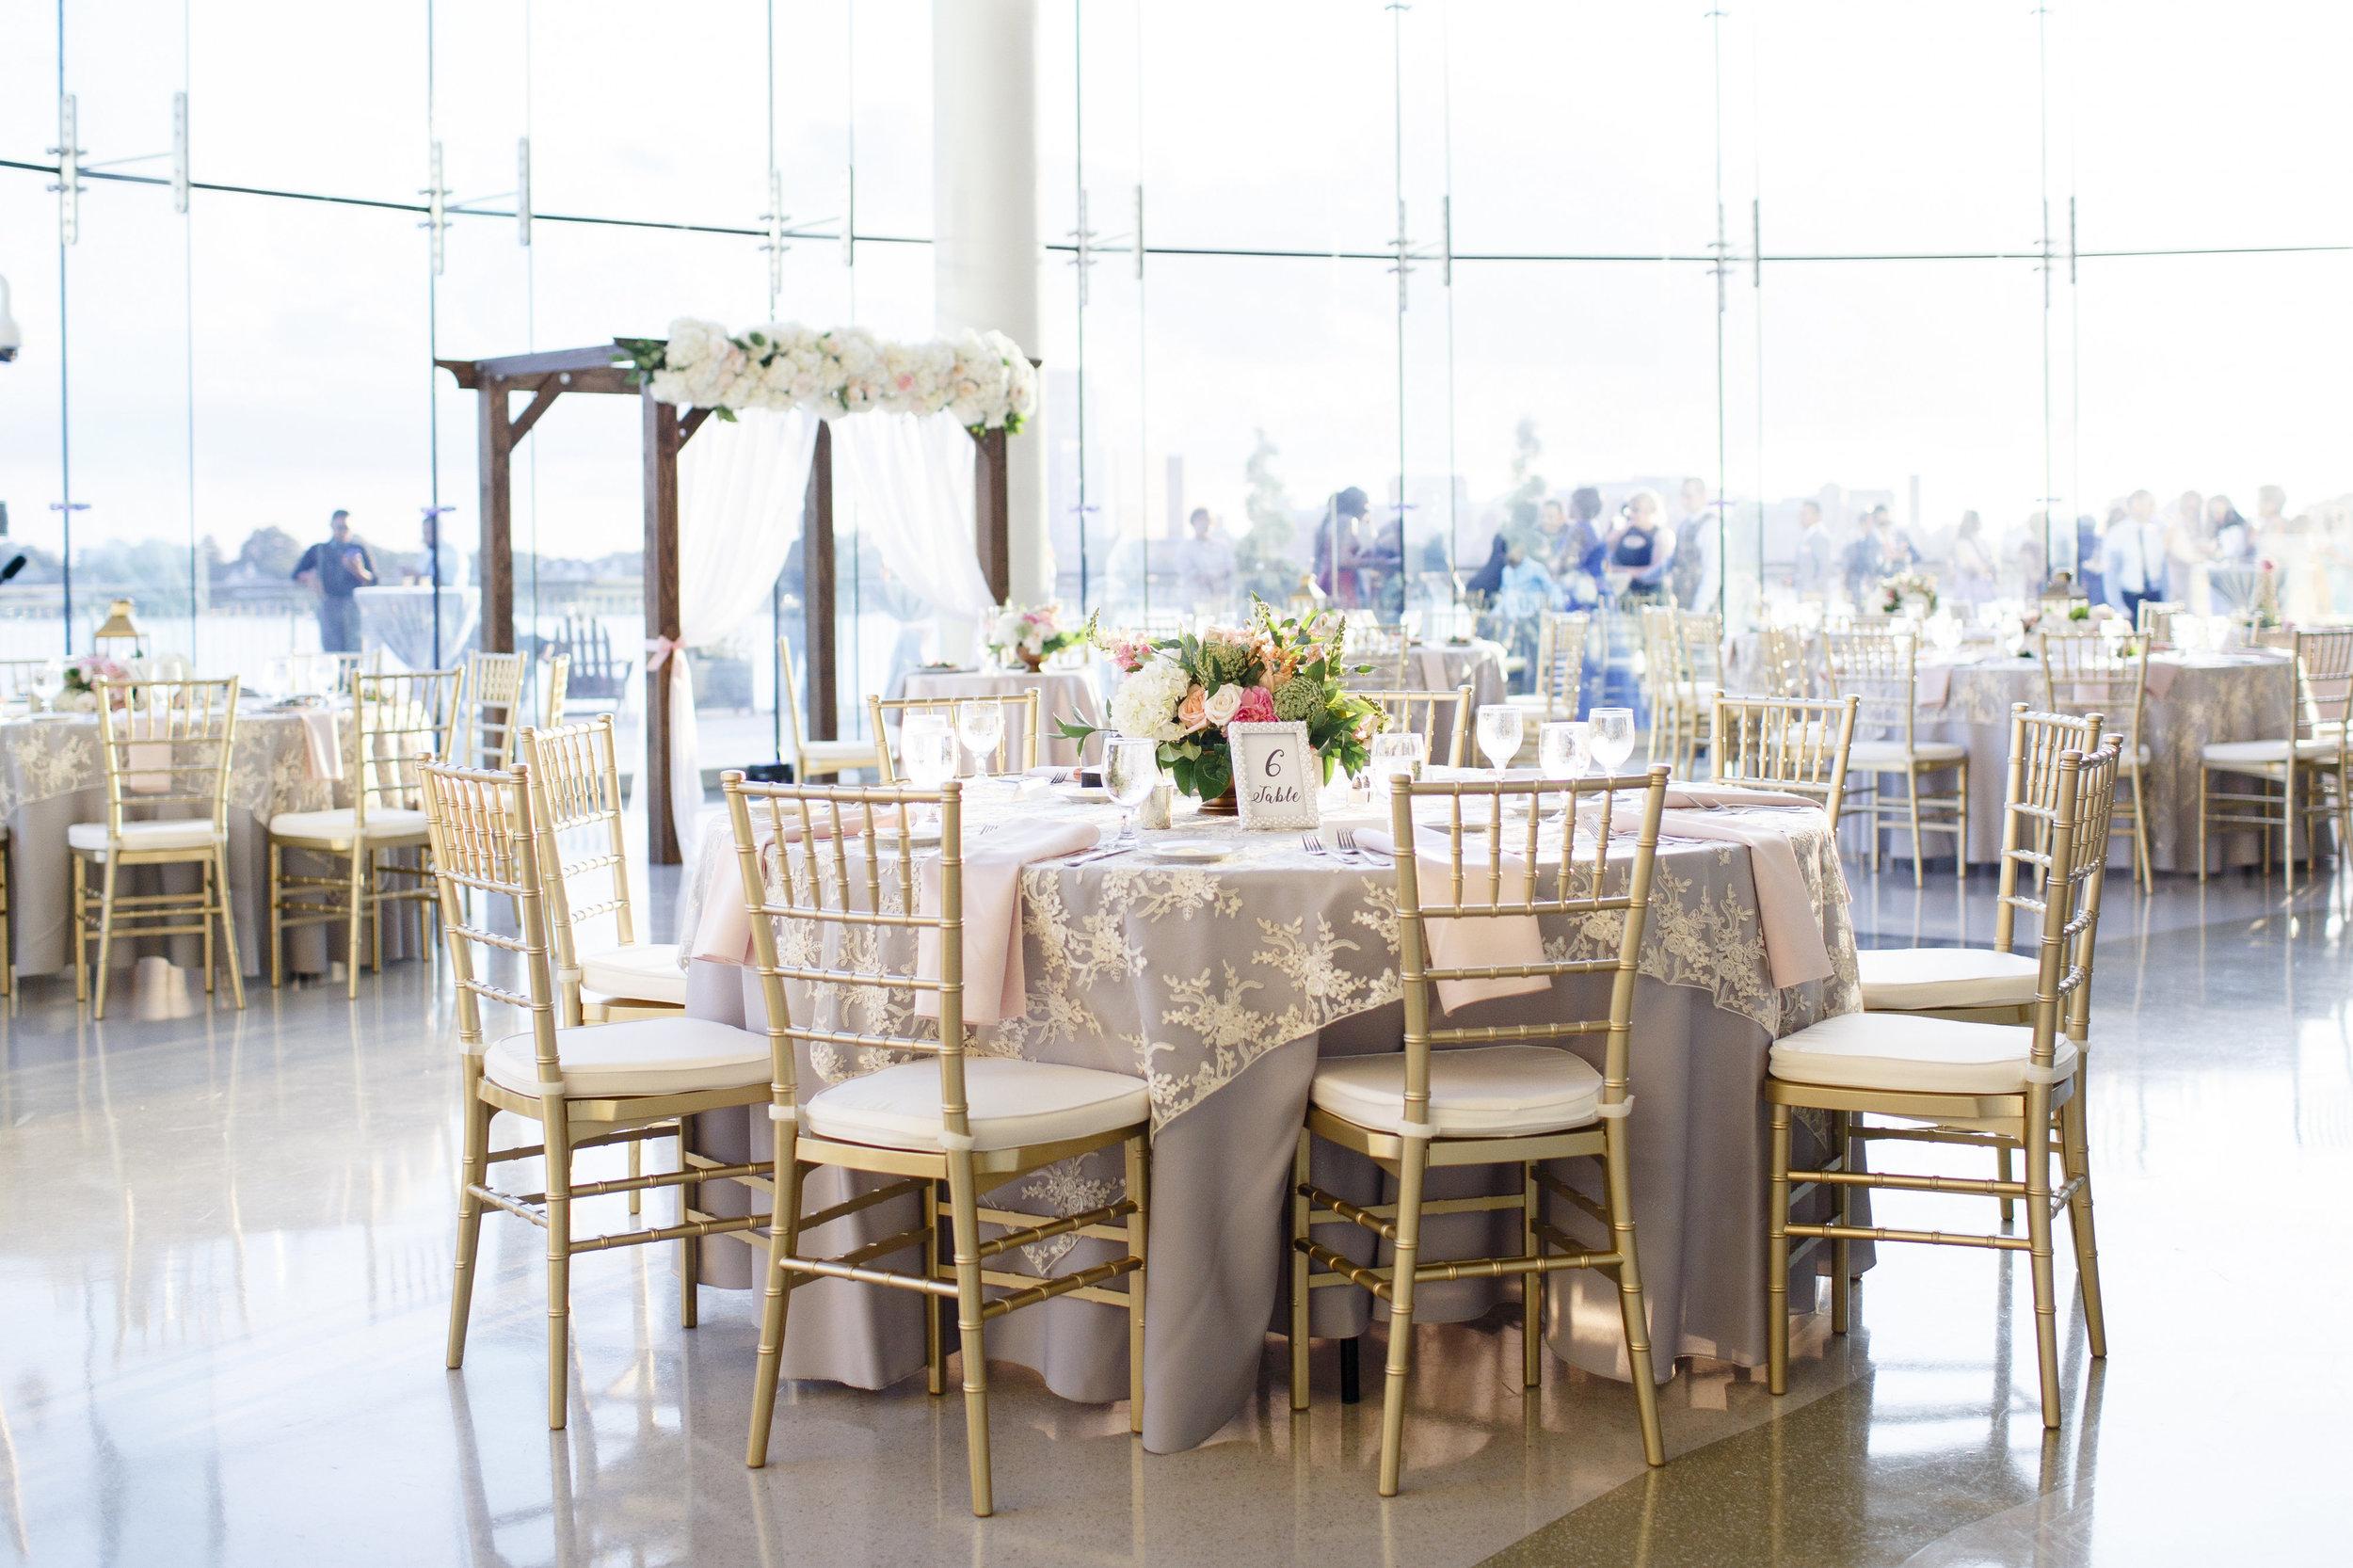 Courtney Inghram Events Wedding Florist at Half Moone Cruise Terminal Blush Wedding in Norfolk, Virginia Hampton Roads Wedding